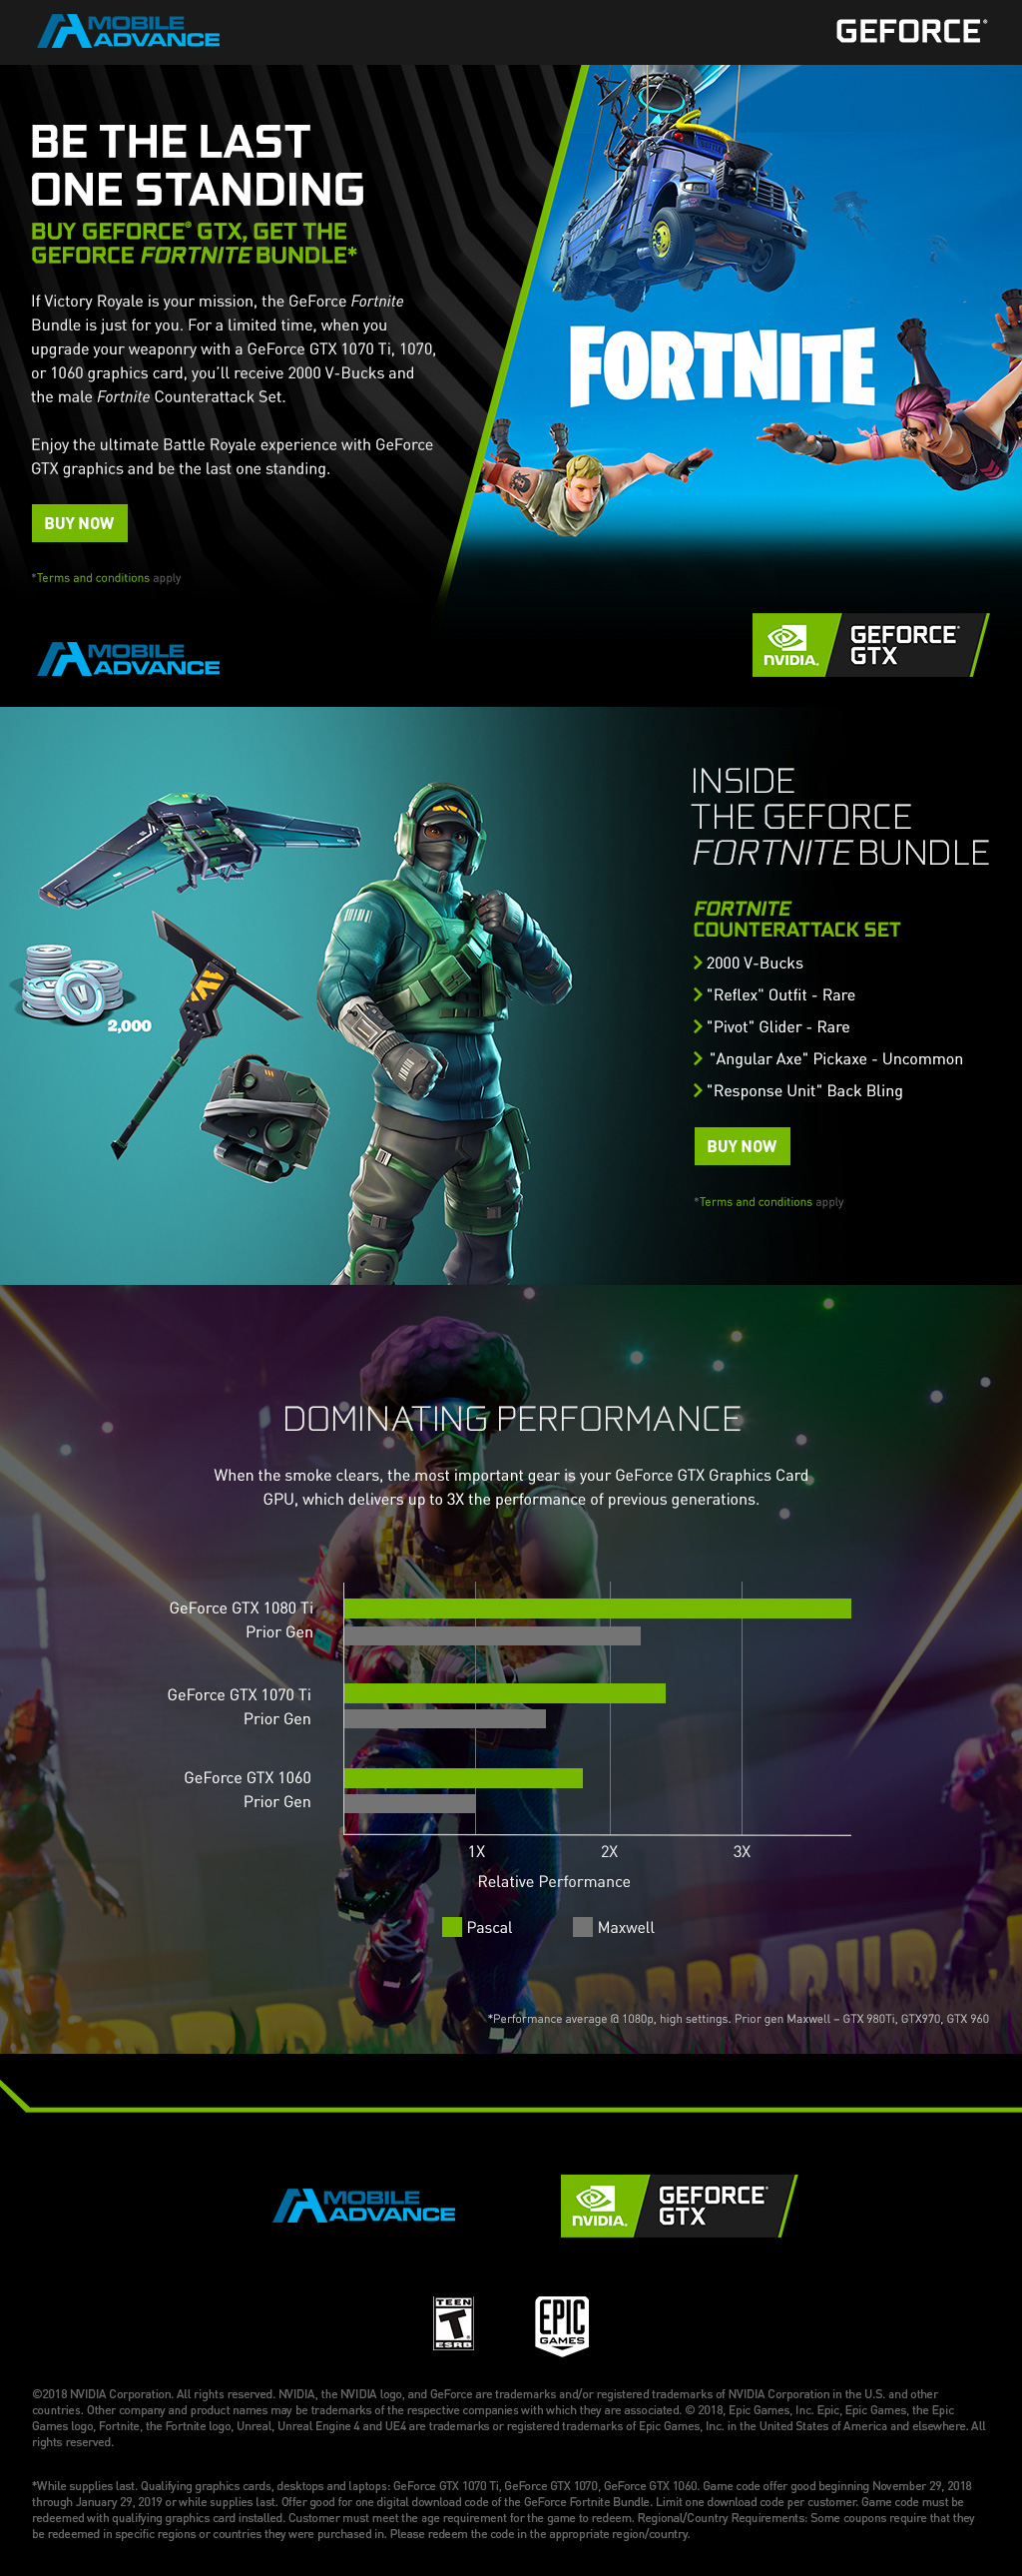 geforce-fortnite-channel-lp-desktop.jpg